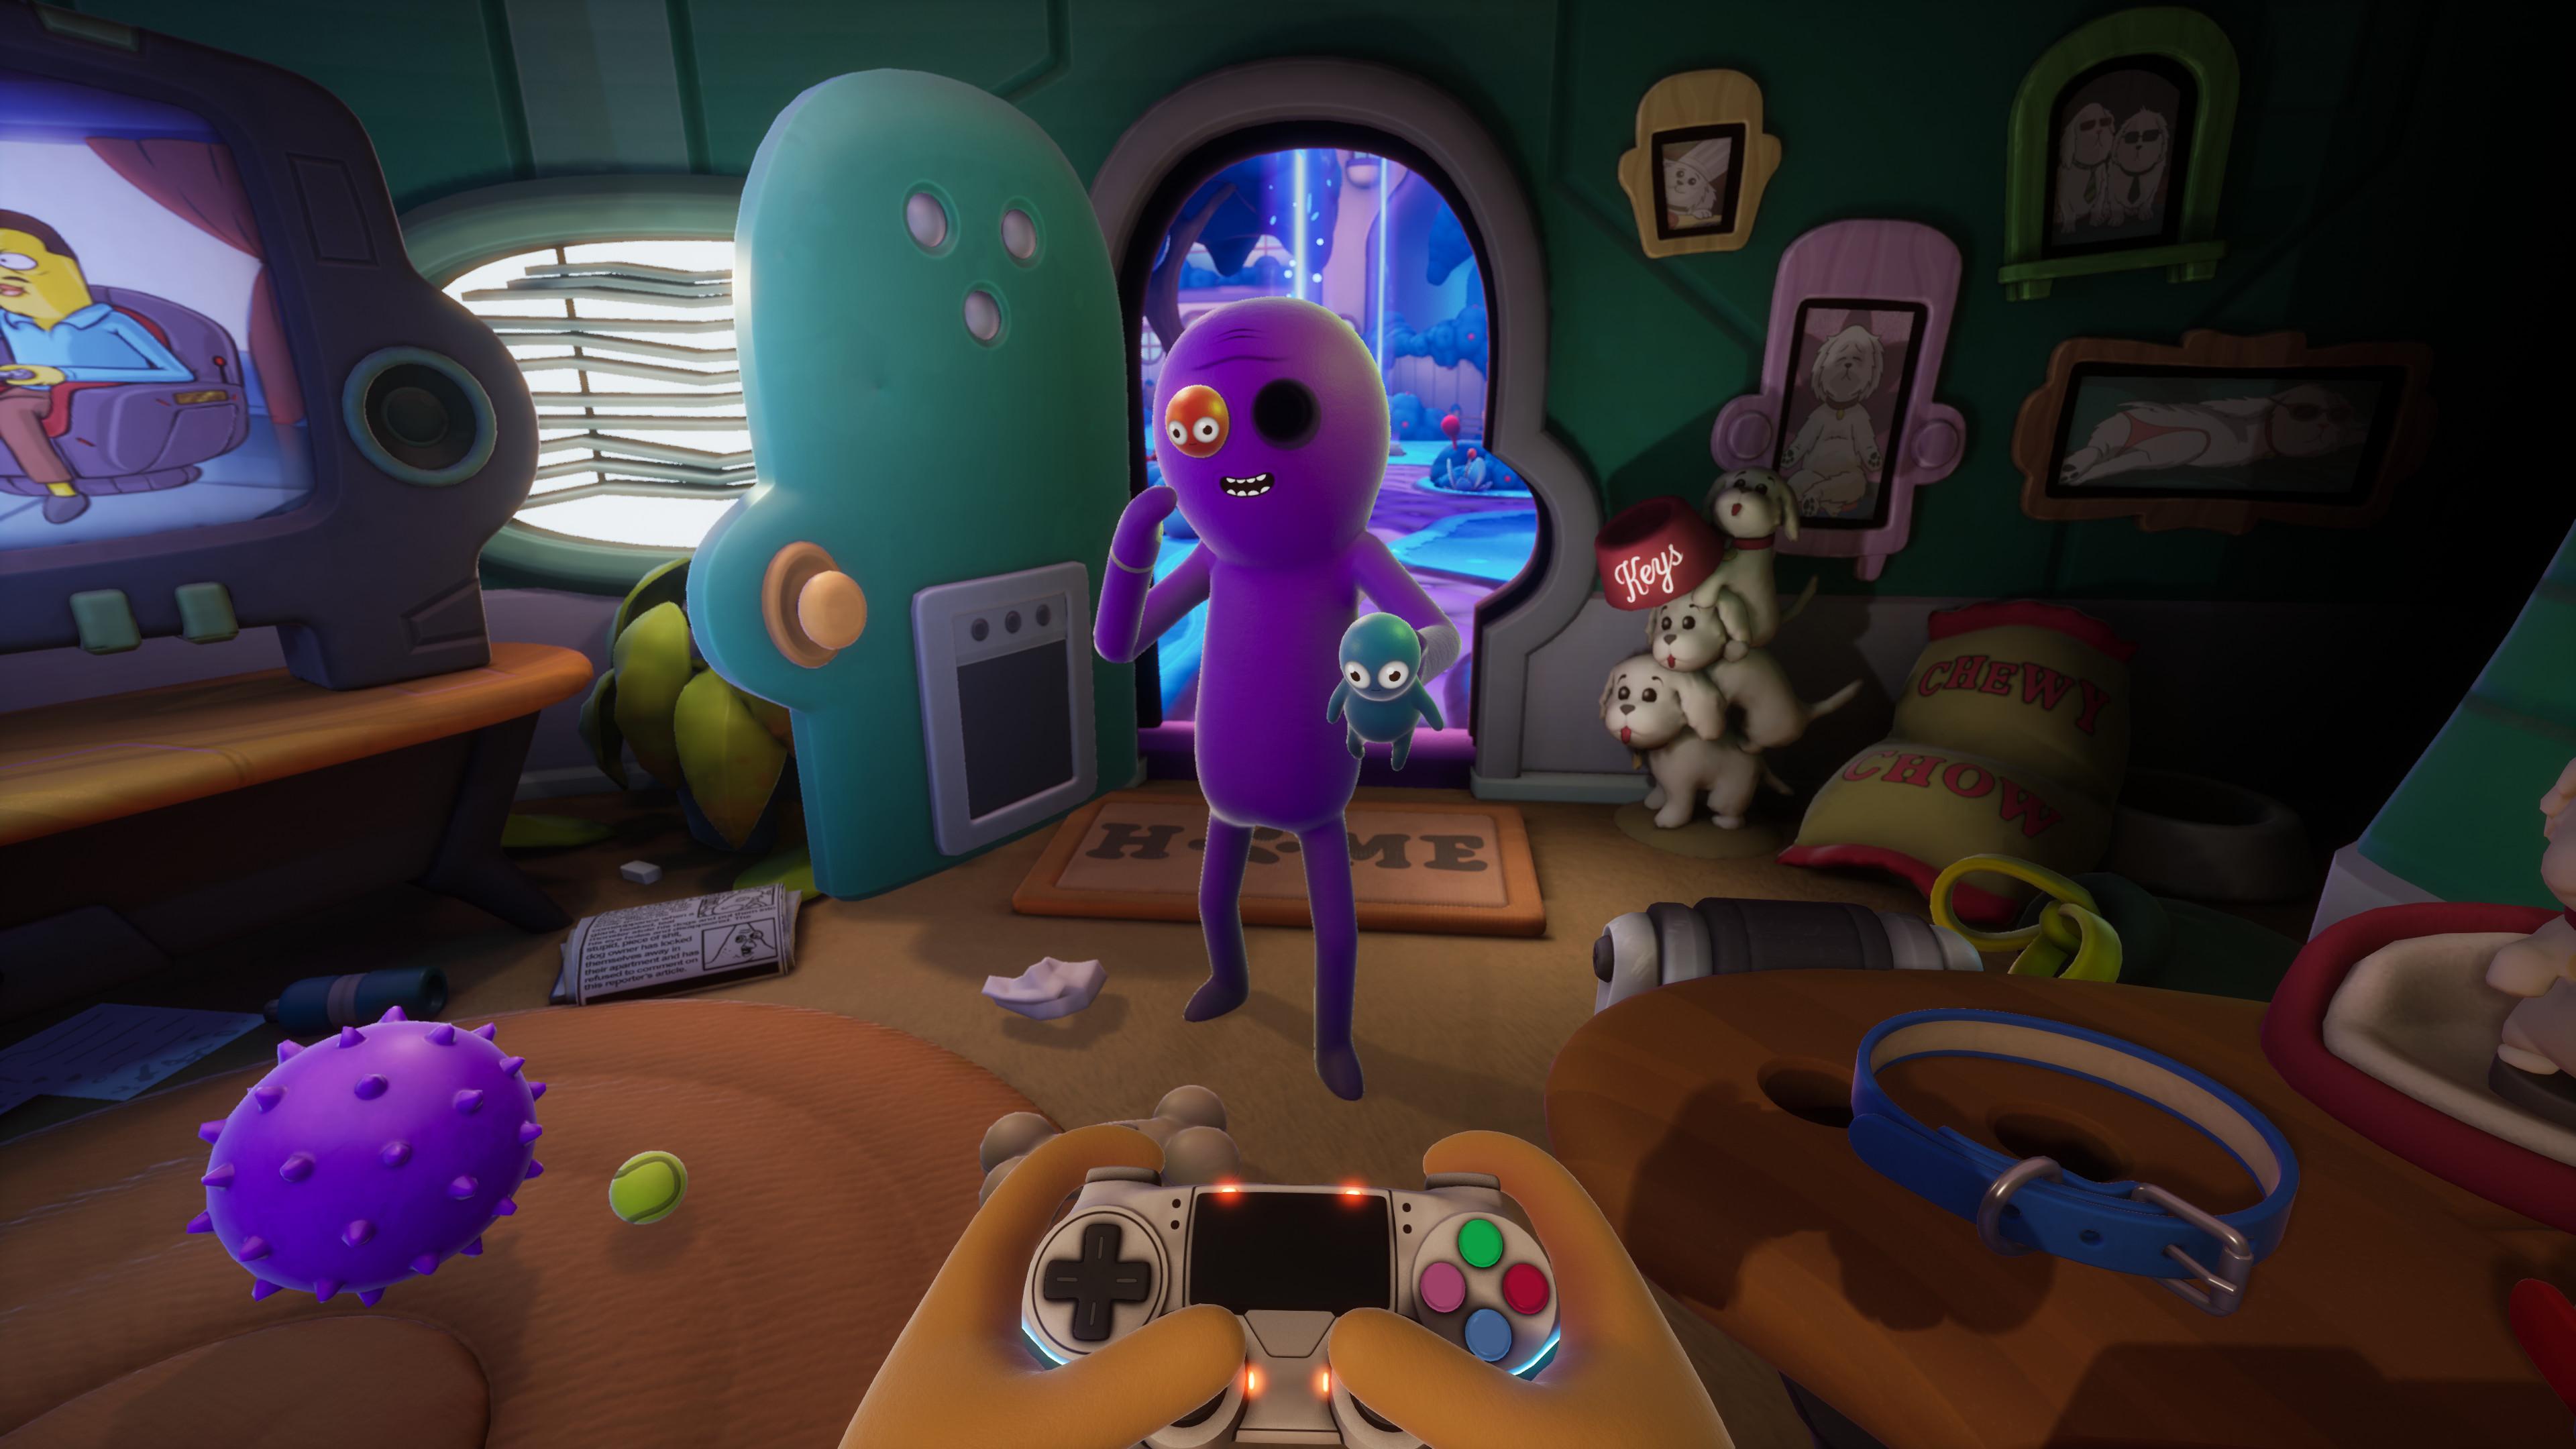 Trover-Saves-the-Universe-Steam-Oculus-Rift-HTC-Vive-PlayStation-VR-PSVR